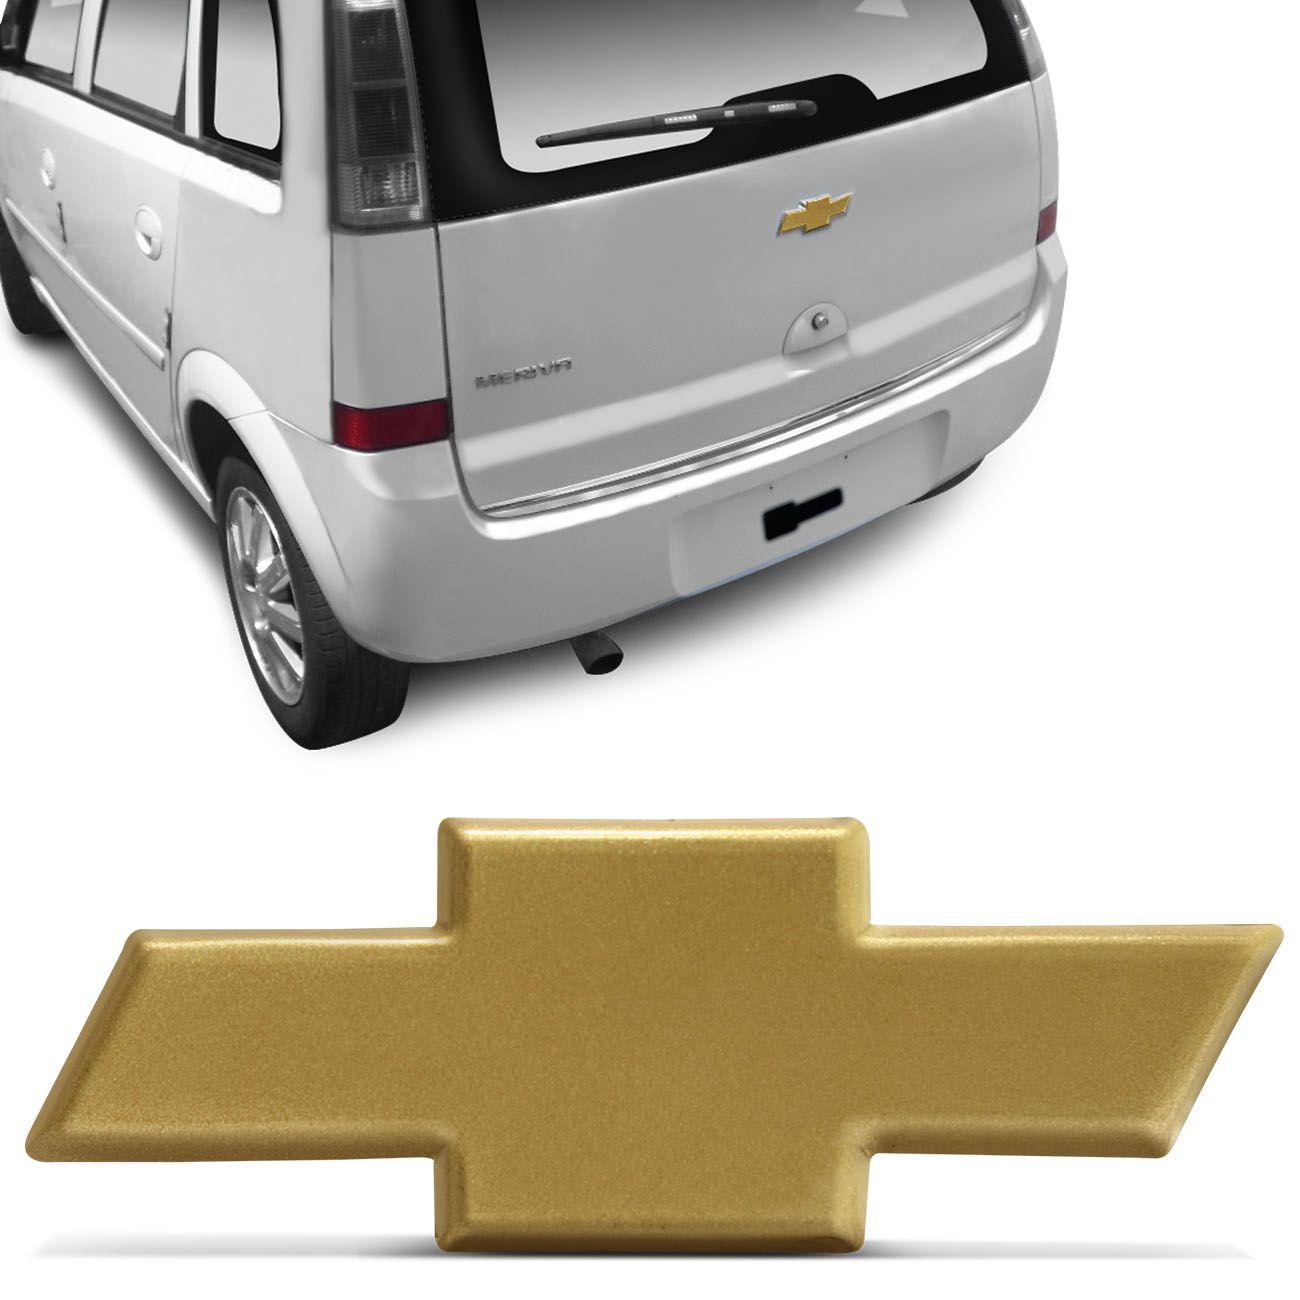 Emblema Chevrolet Gravata Dourado Meriva 01 a 12 Porta - malas